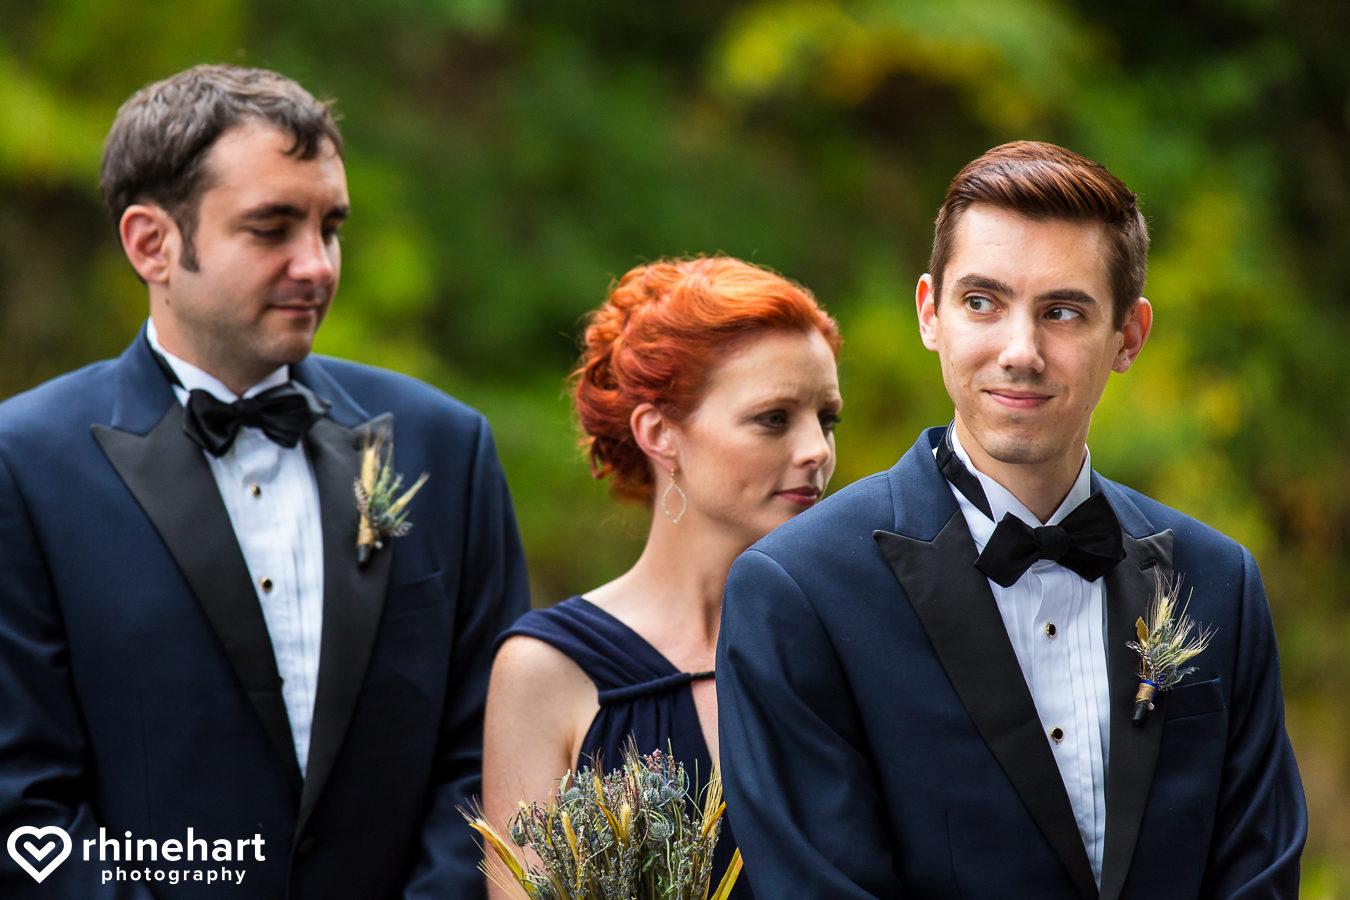 ledges-hotel-wedding-photographers-poconos-hawley-pa-best-creative-unique-artistic-fun-romantic-211